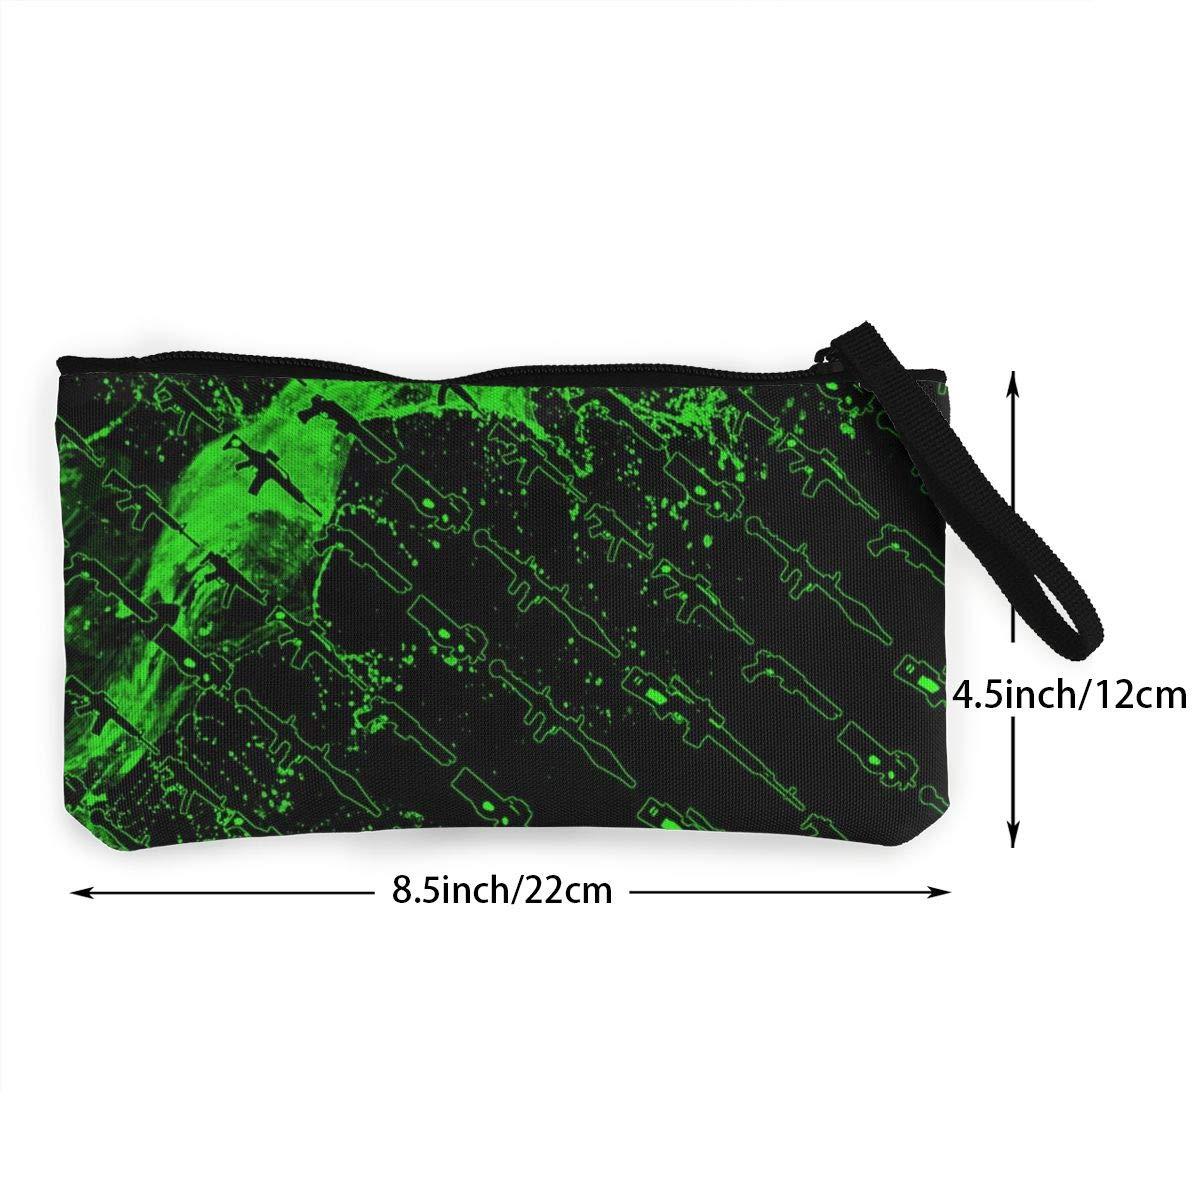 YUANSHAN Green Guns Unisex Canvas Coin Purse Change Cash Bag Zipper Small Purse Wallets with Handle